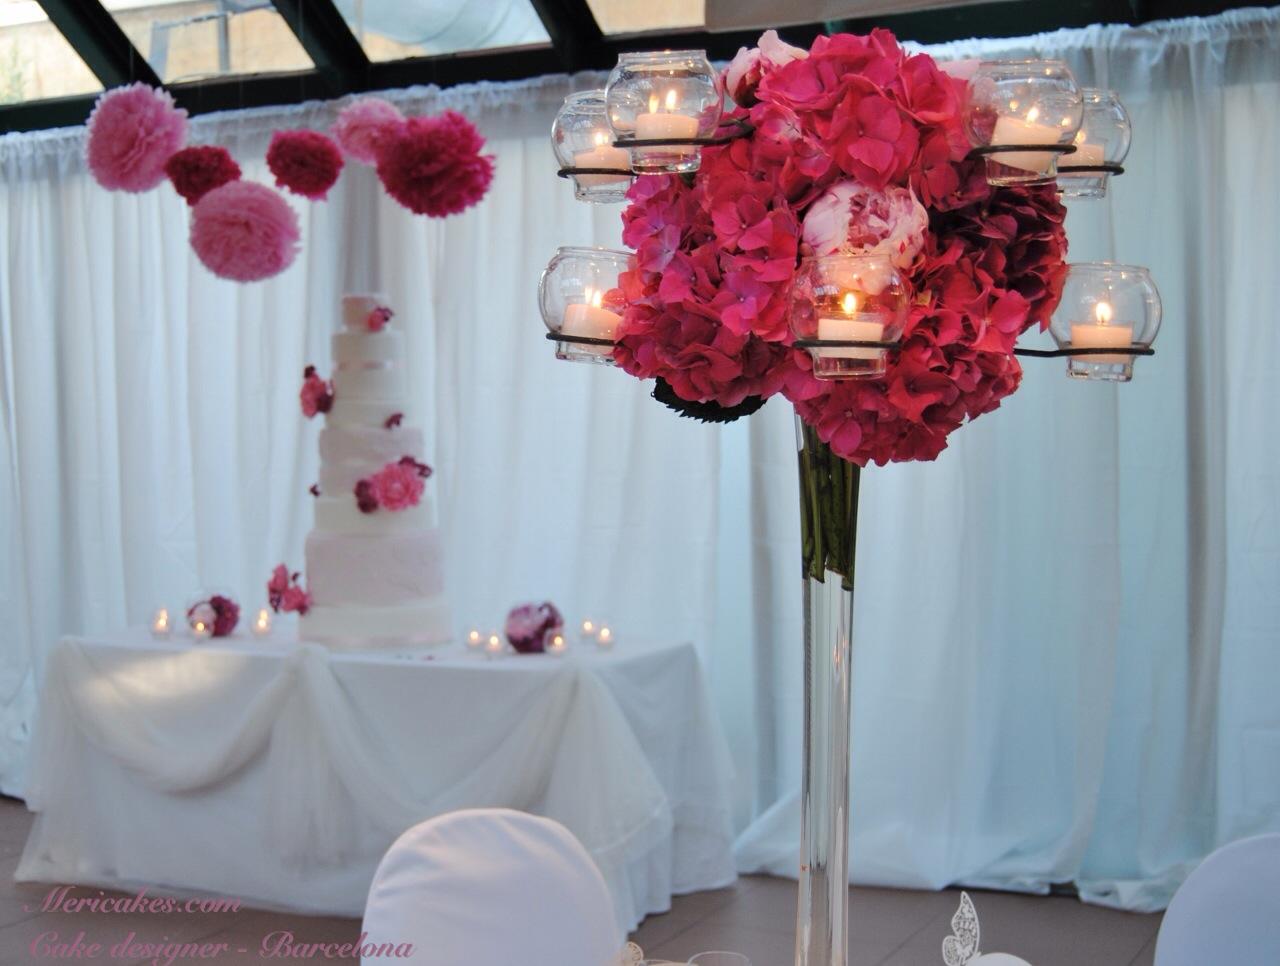 tartas-de-boda-wedding-cakes-pastel-de-boda-barcelona-sugarcraft-sugaspaste-fondant-peony-hydrangeas-hortensias-lace-encaje-mer-2